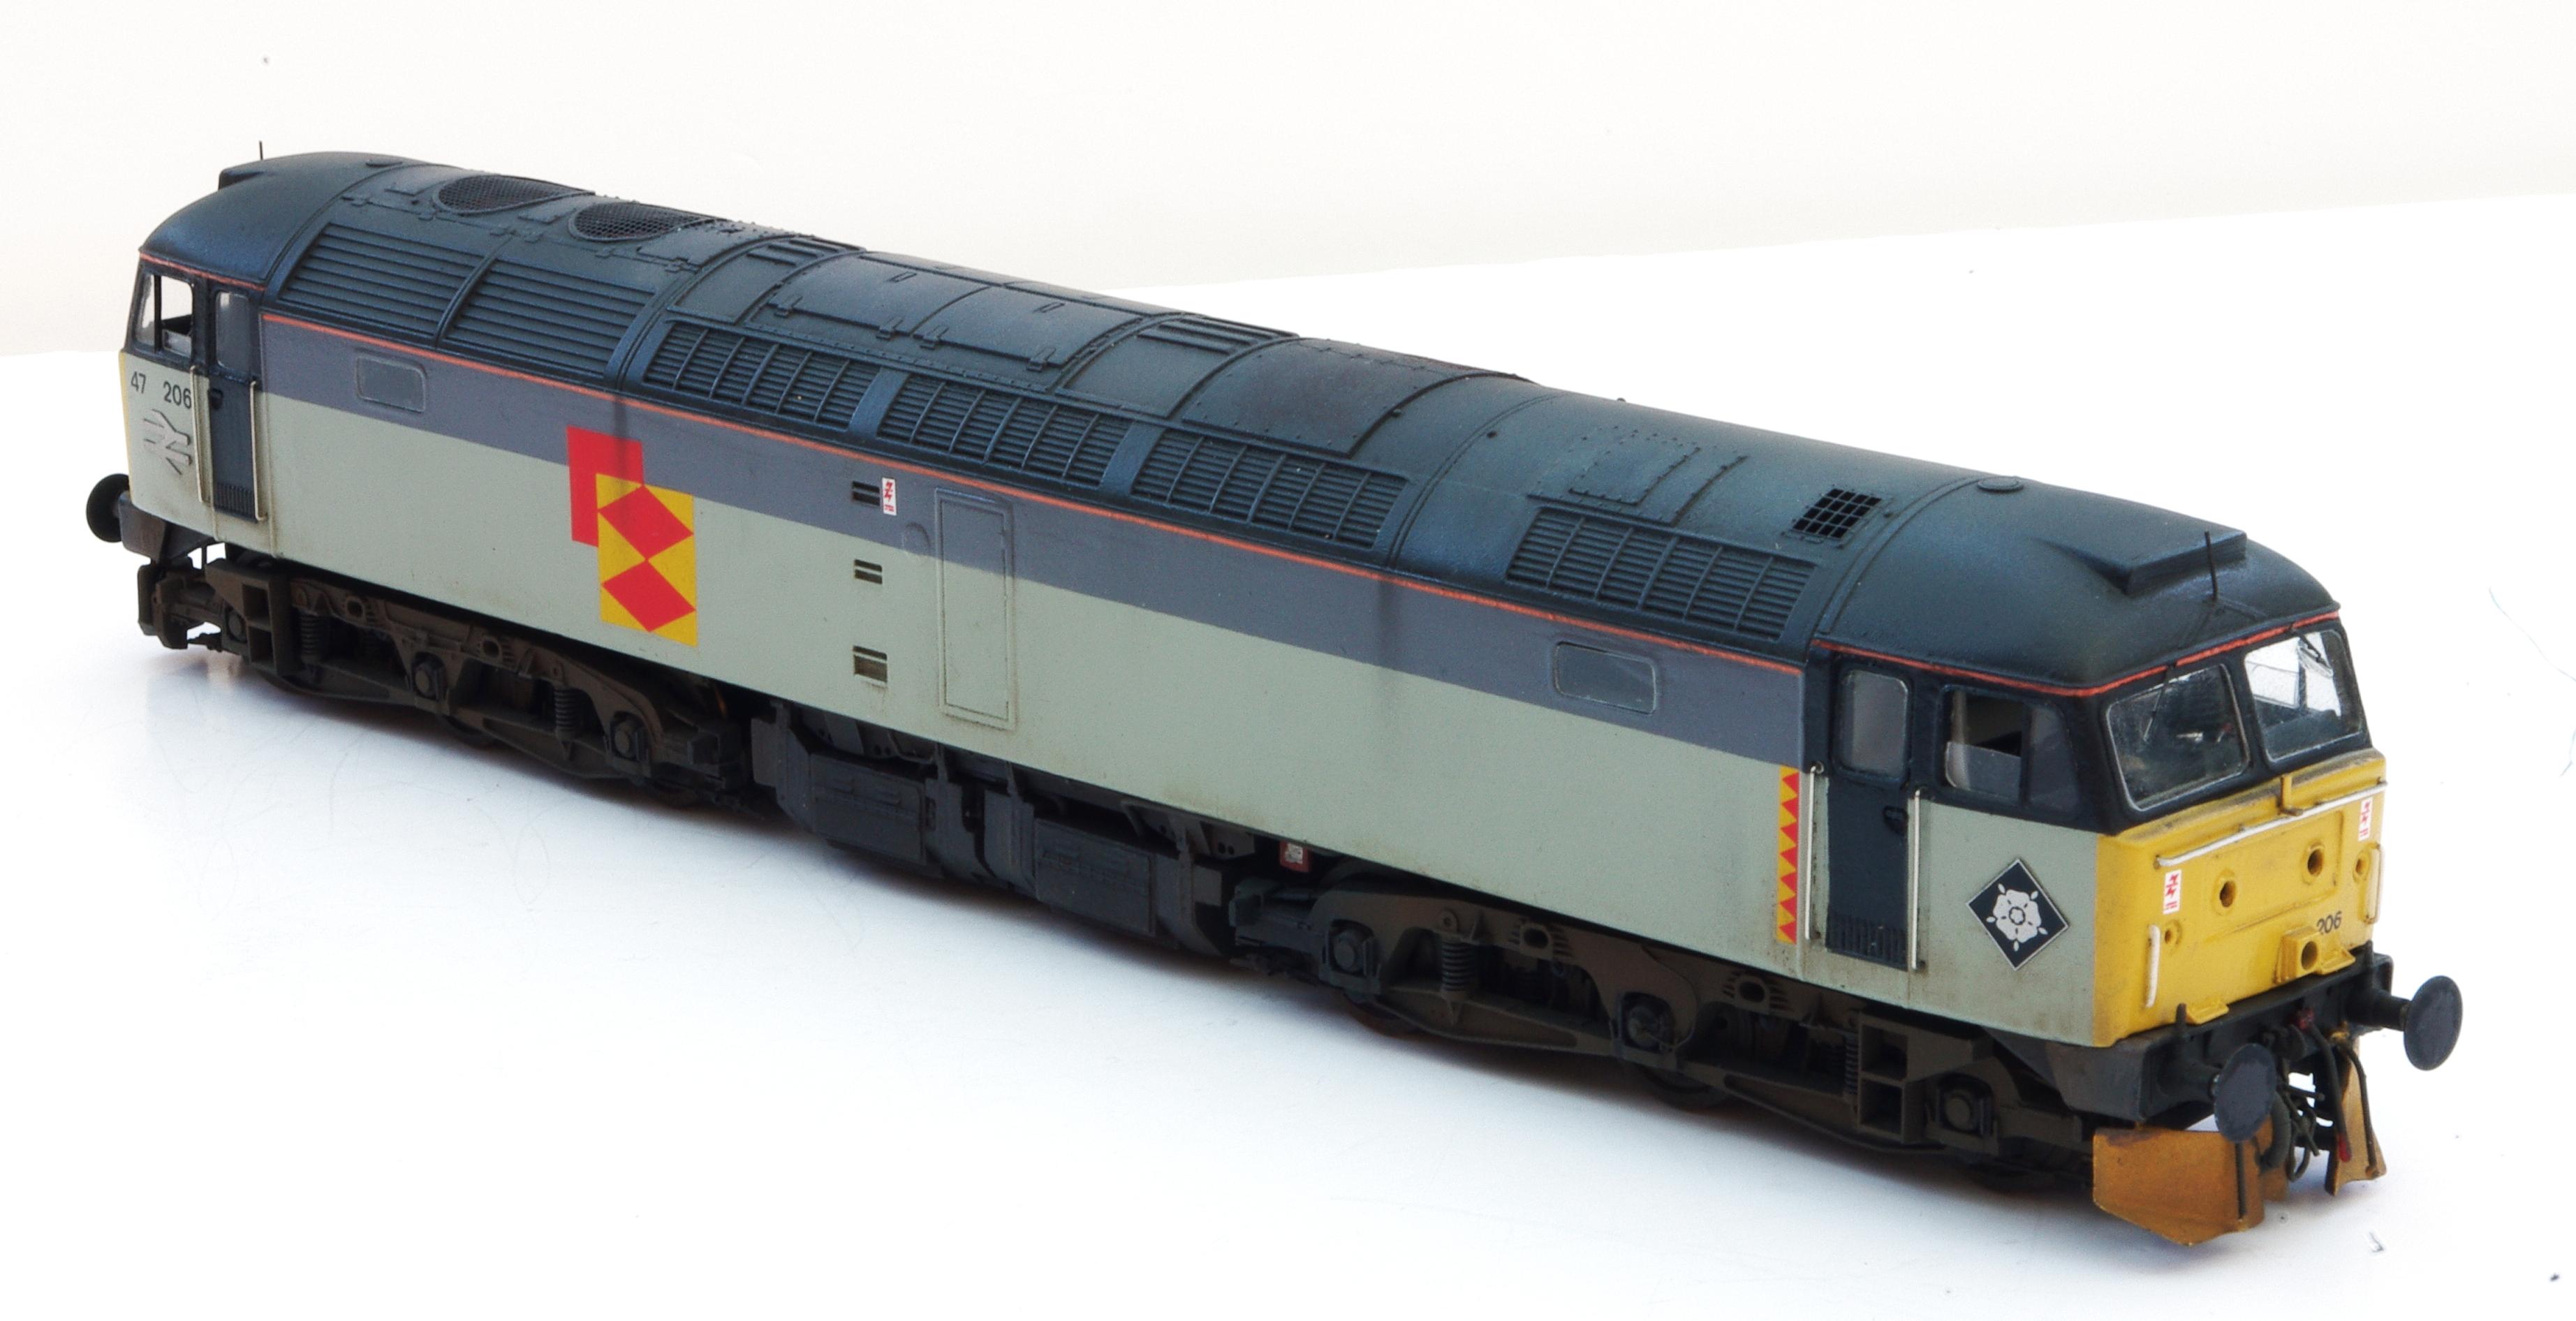 The Hybrid Class 47